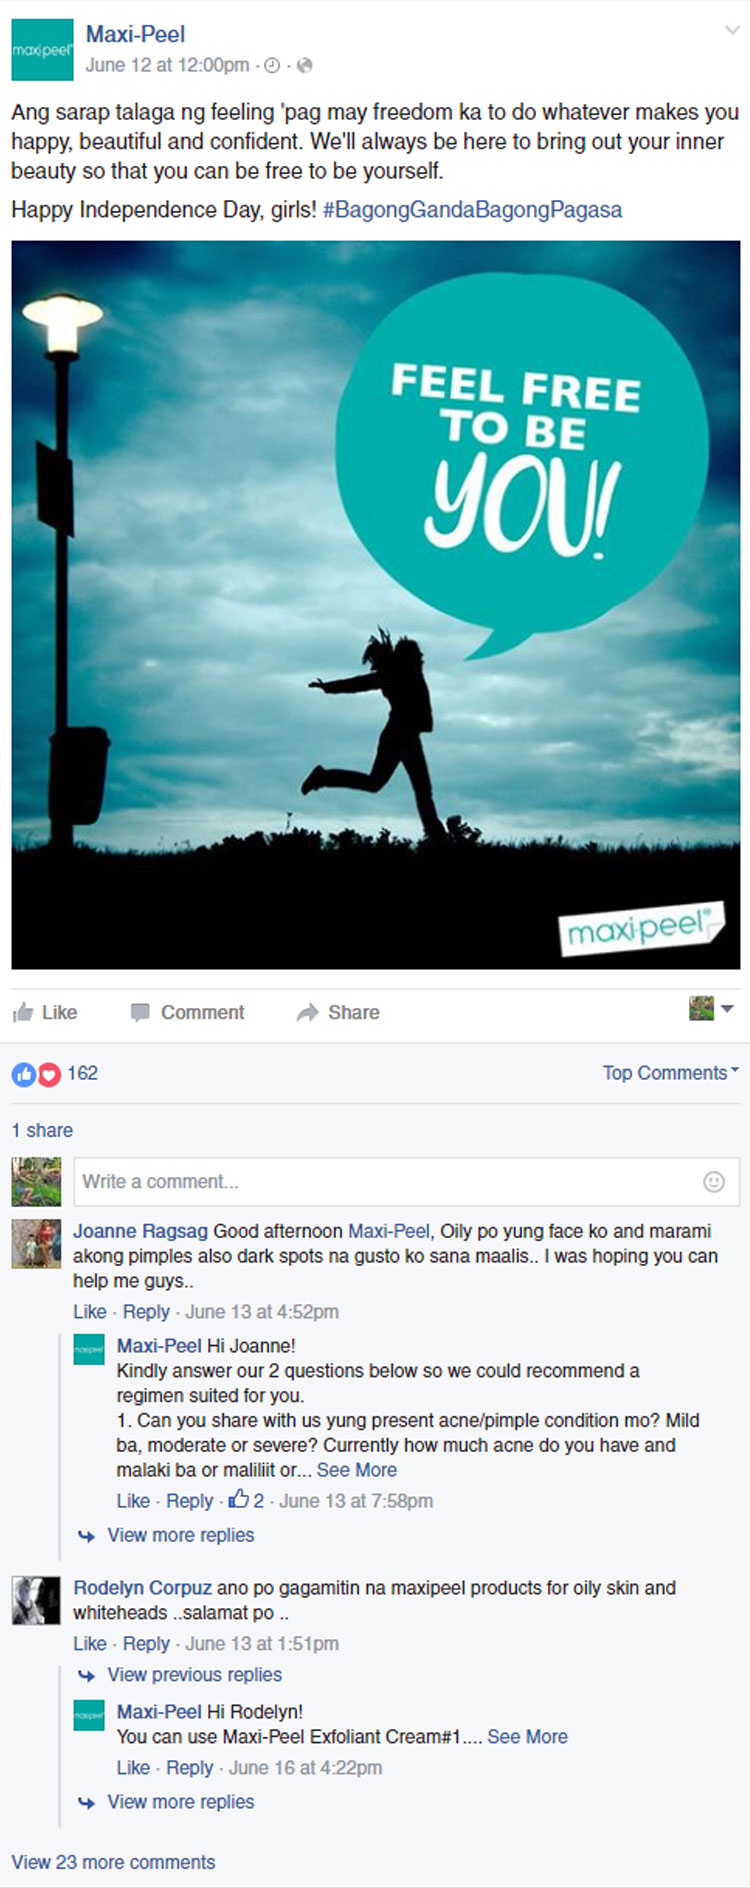 Maxi-Peel Facebook Post